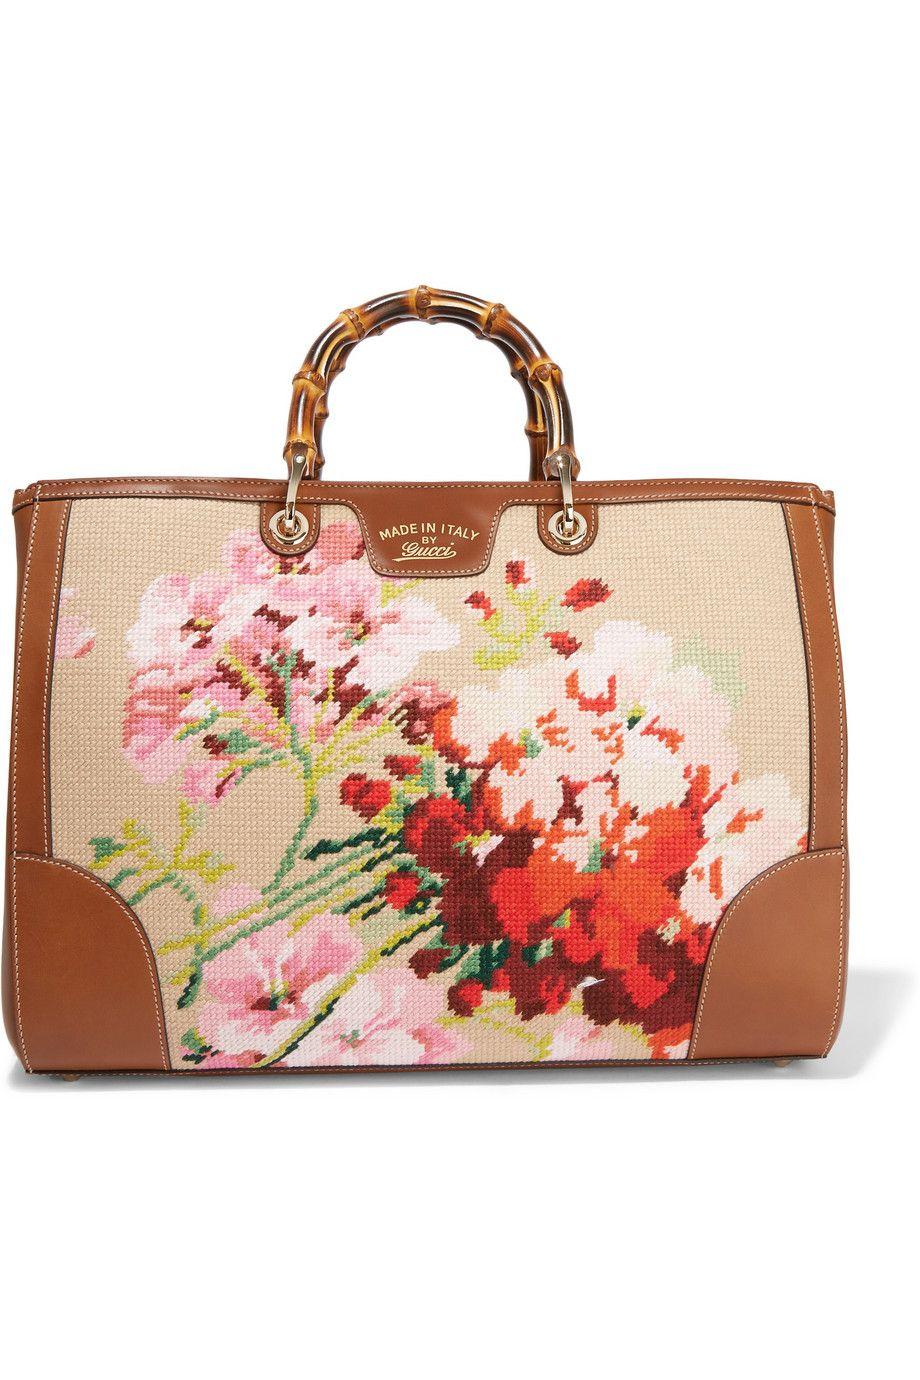 6e5fe75316 Gucci | Bamboo Shopper large leather-trimmed cross-stitch canvas tote